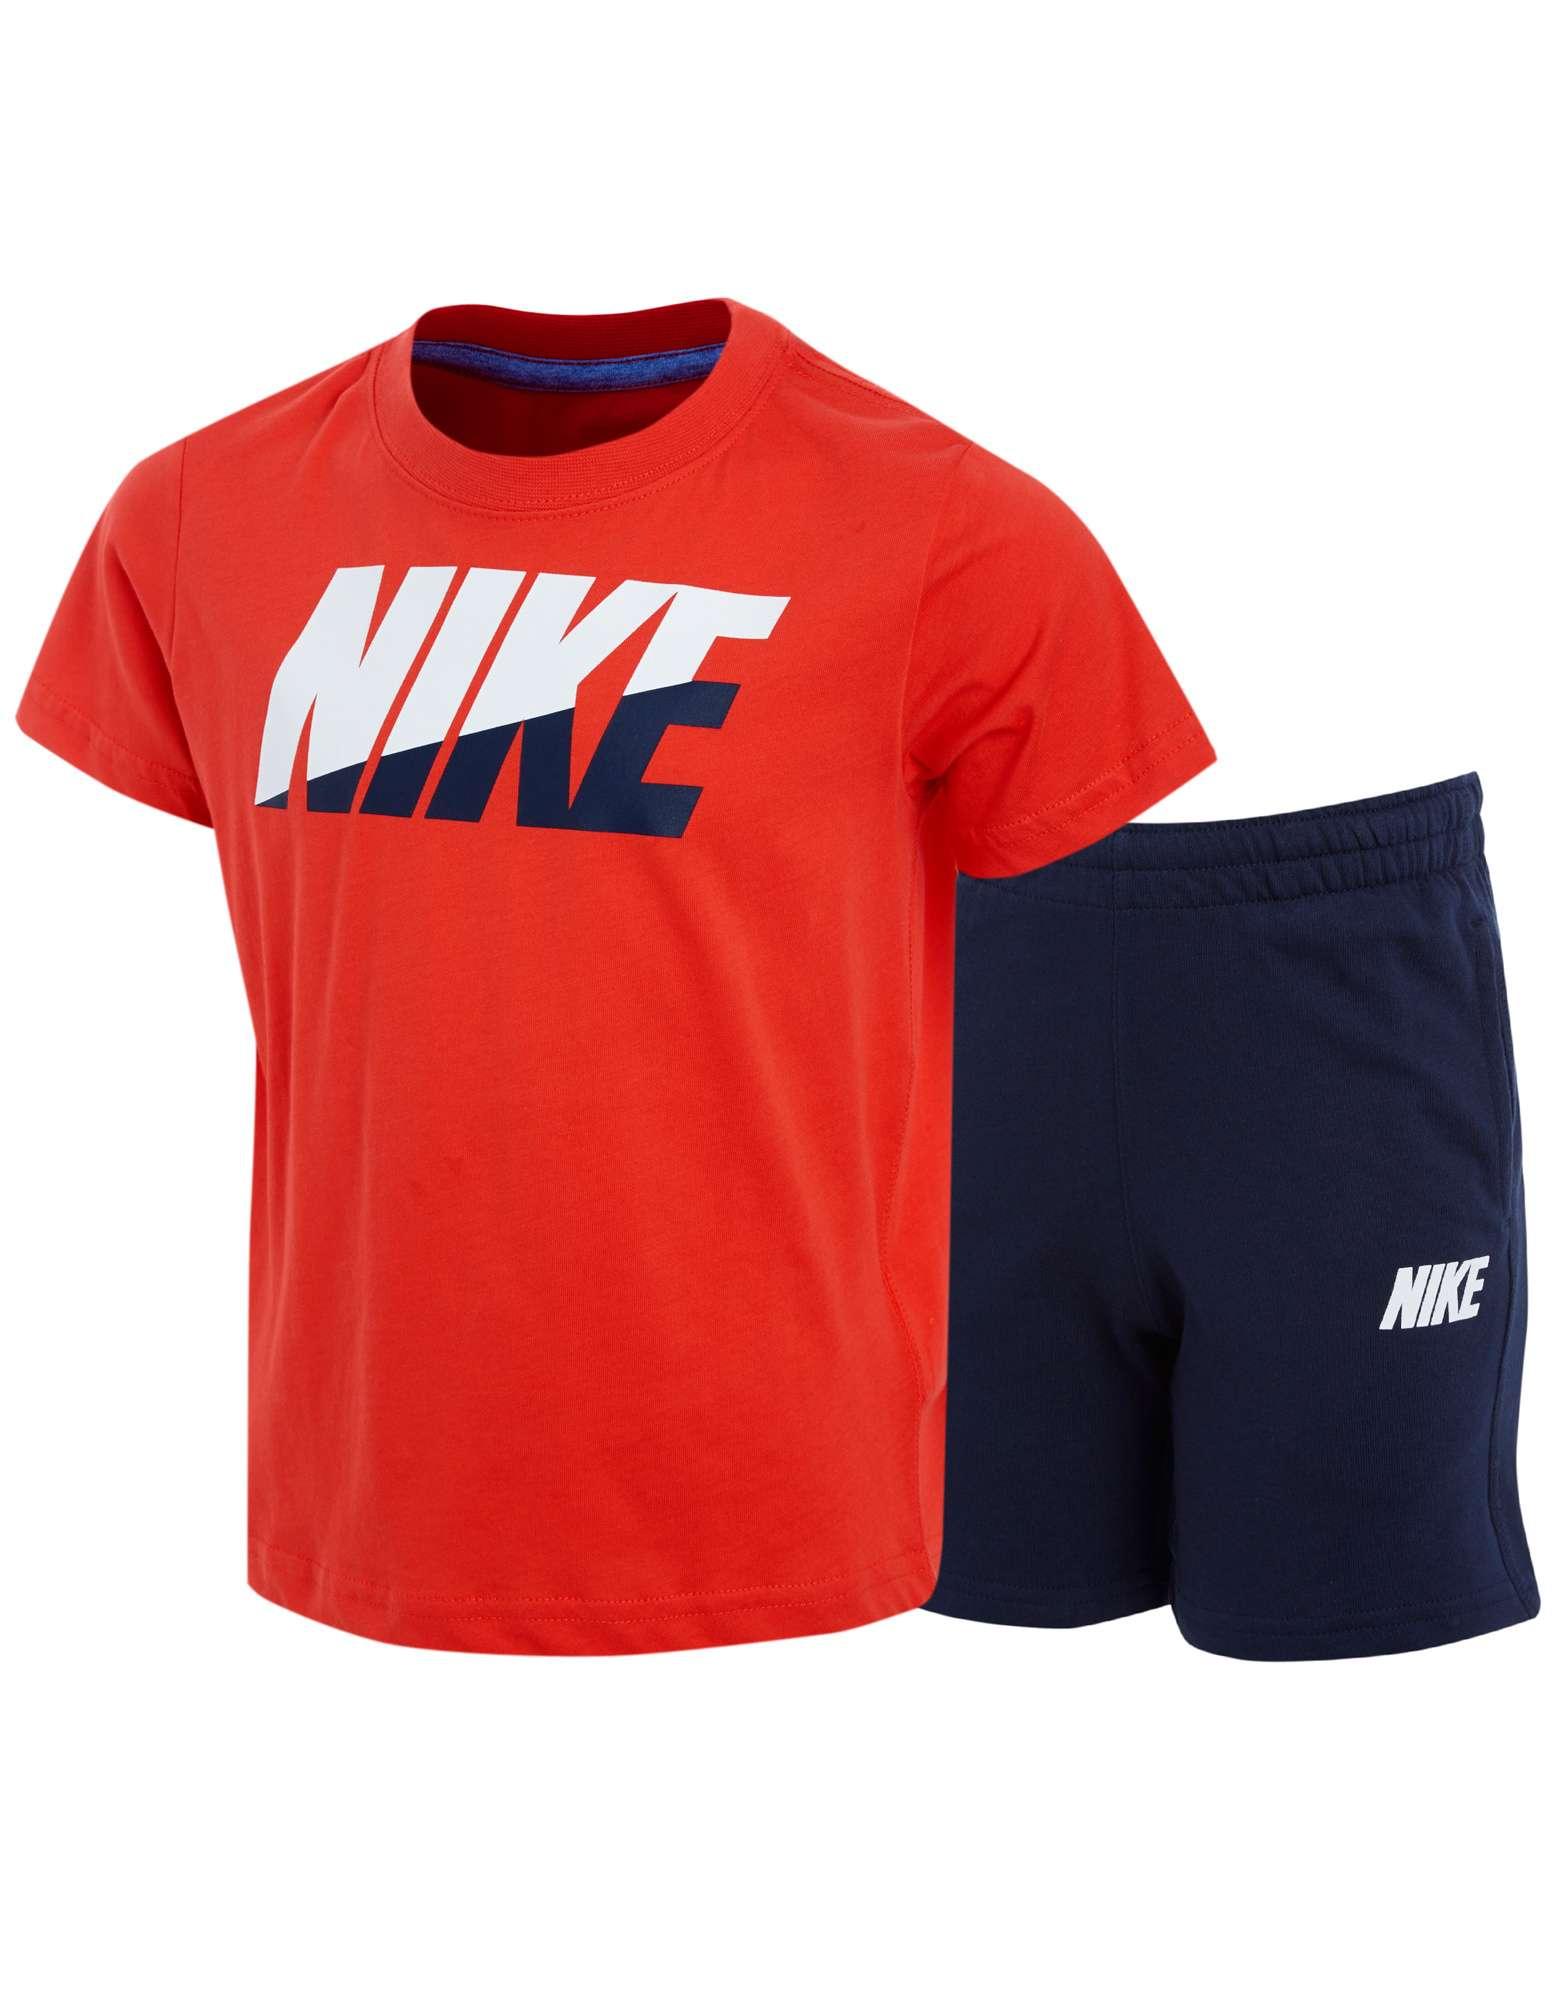 Nike Block T-Shirt/Shorts Set Children's